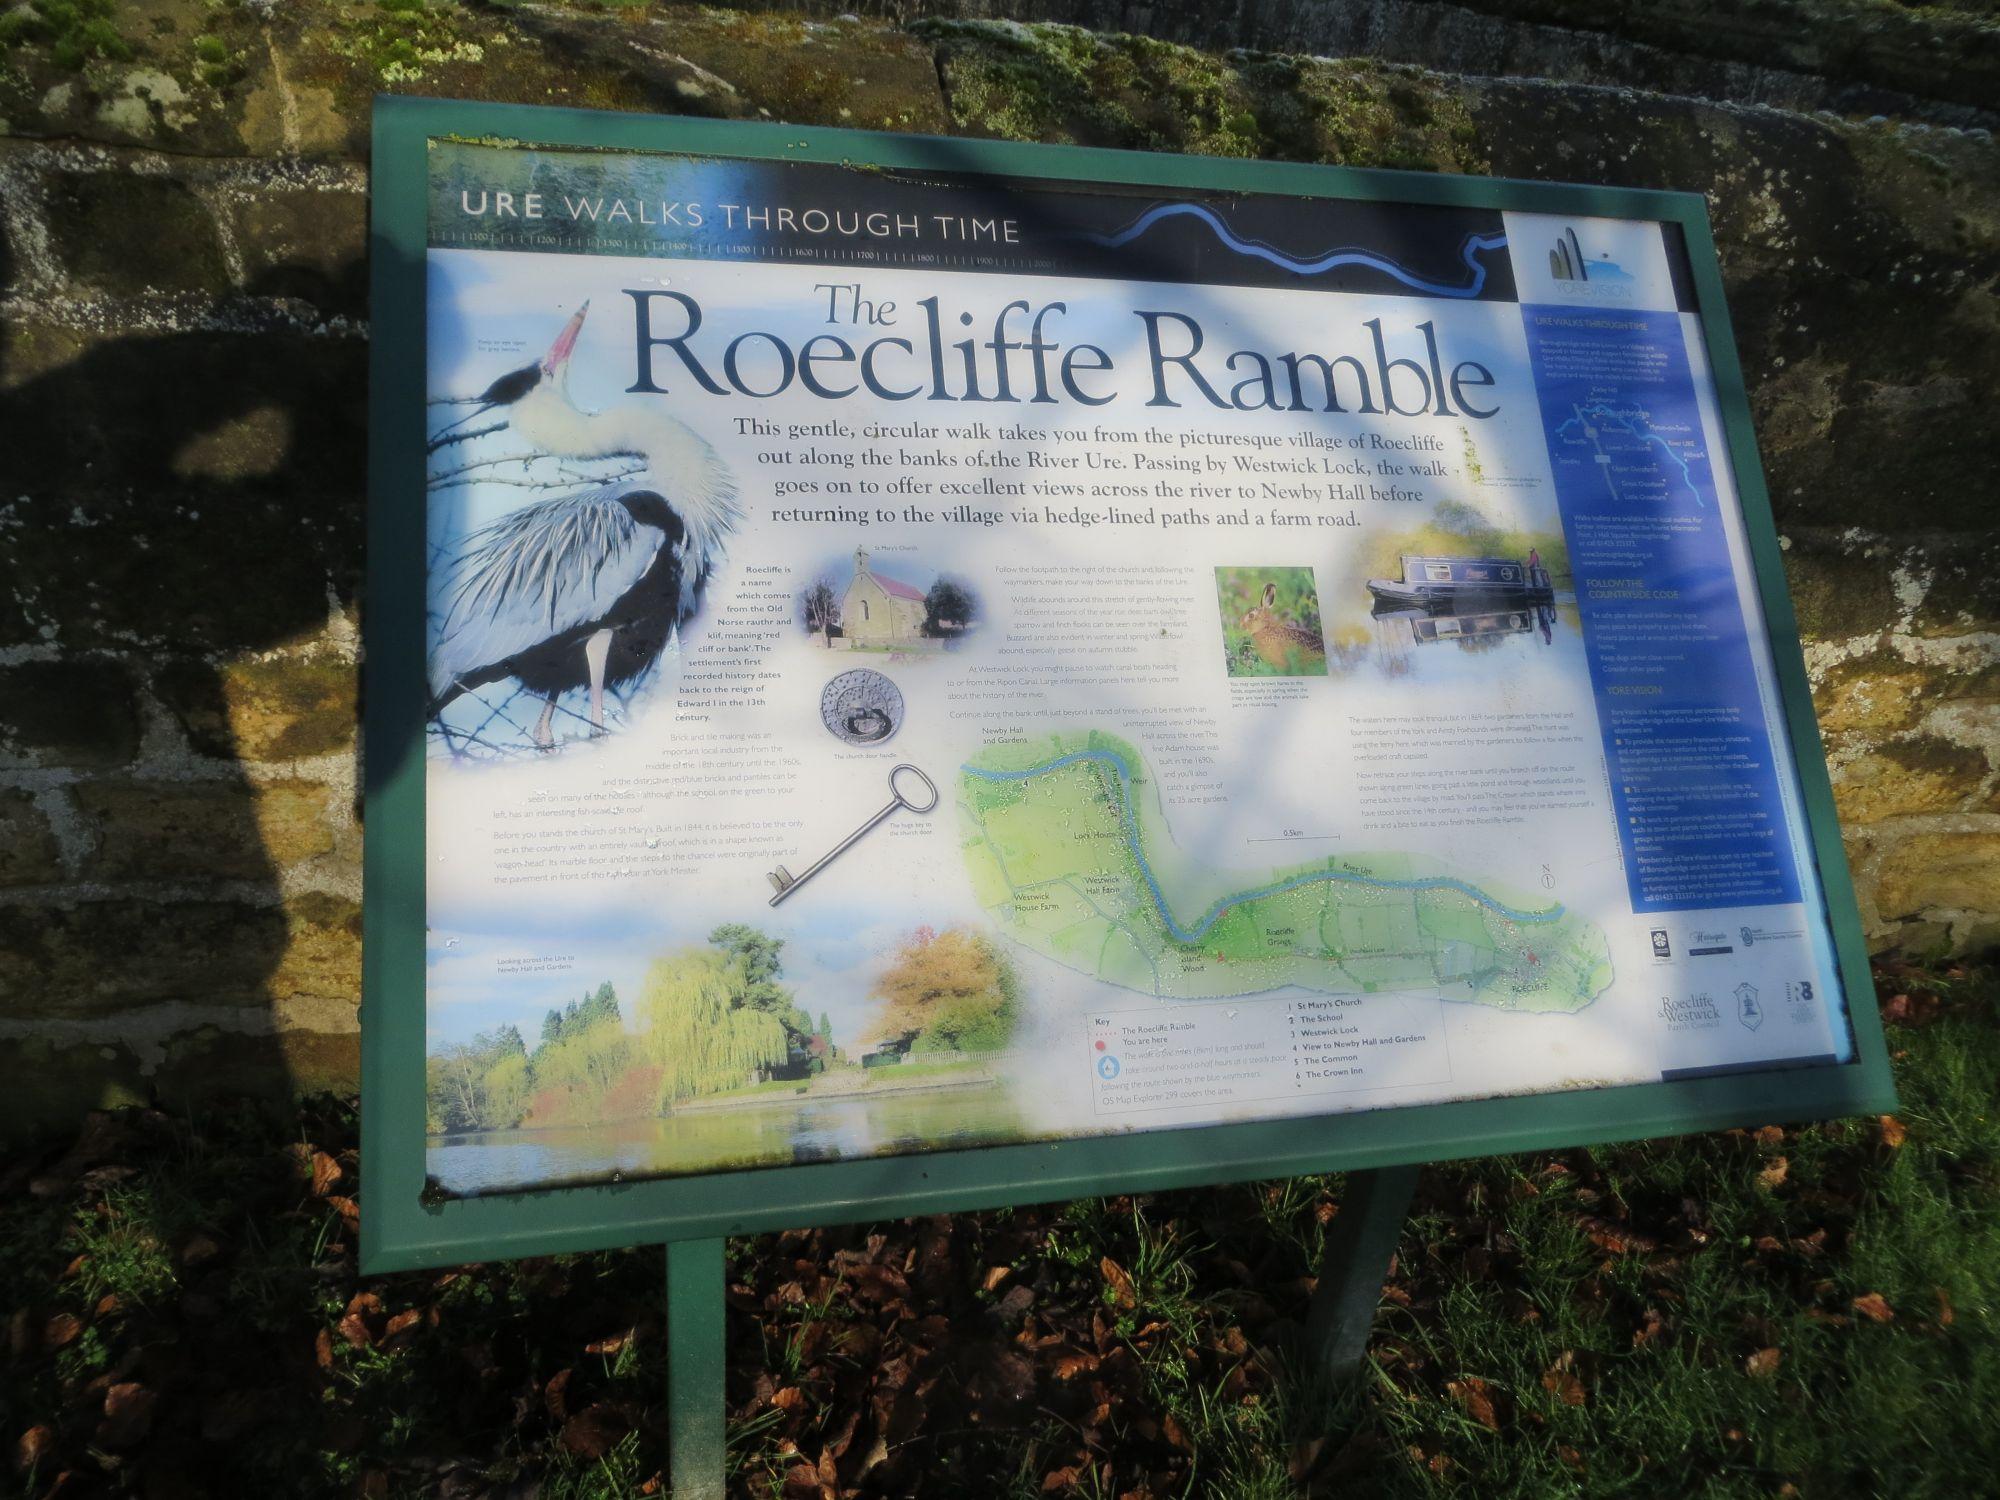 Roecliffe Ramble